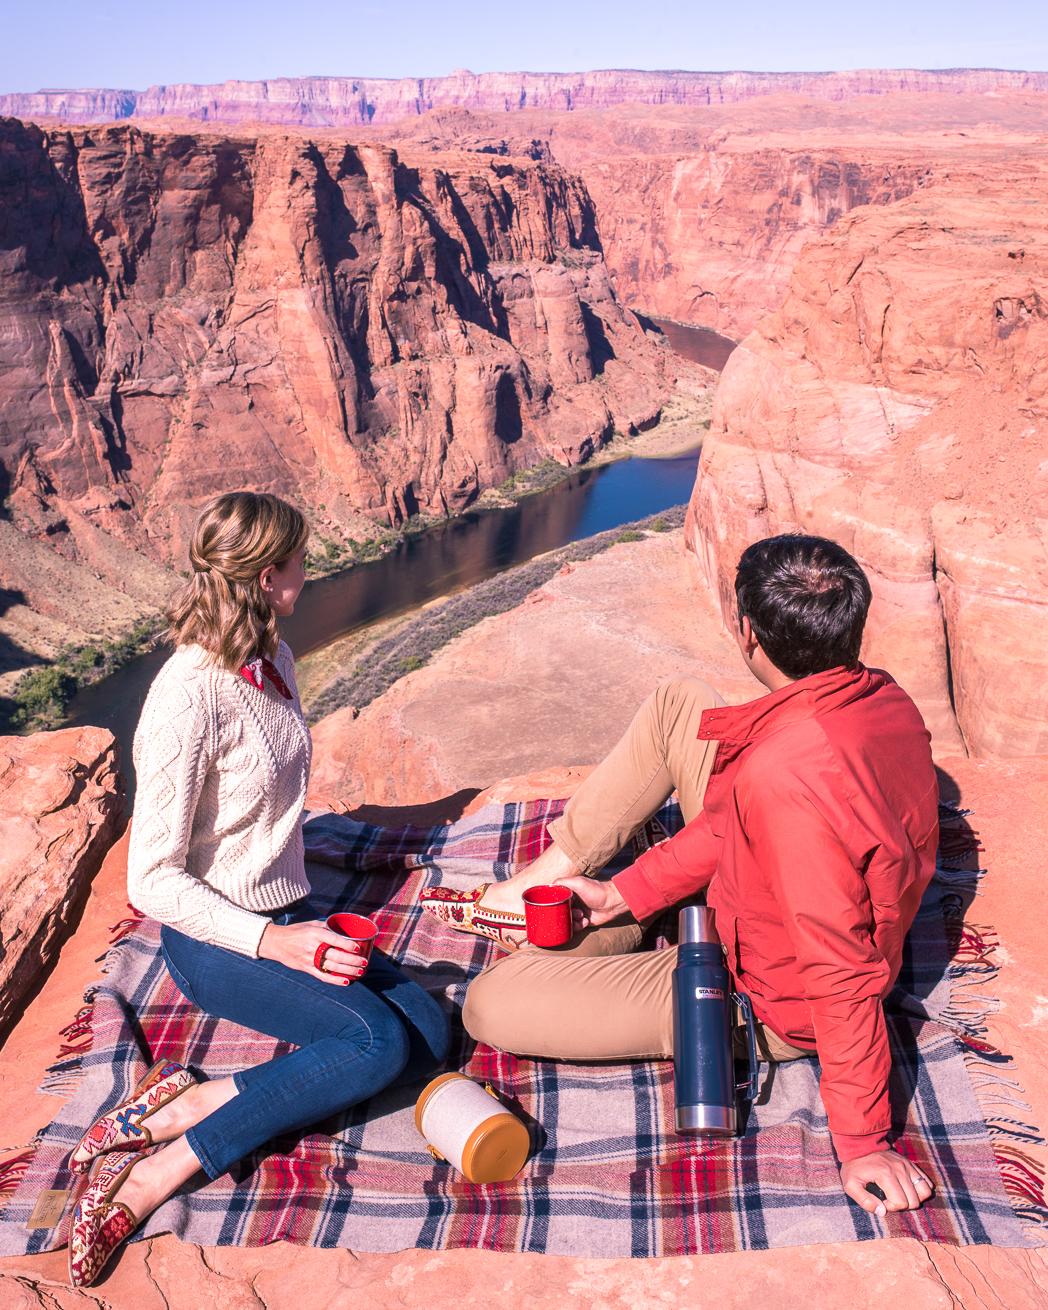 Stacie Flinner Grand Canyon Artemis Design Co-18